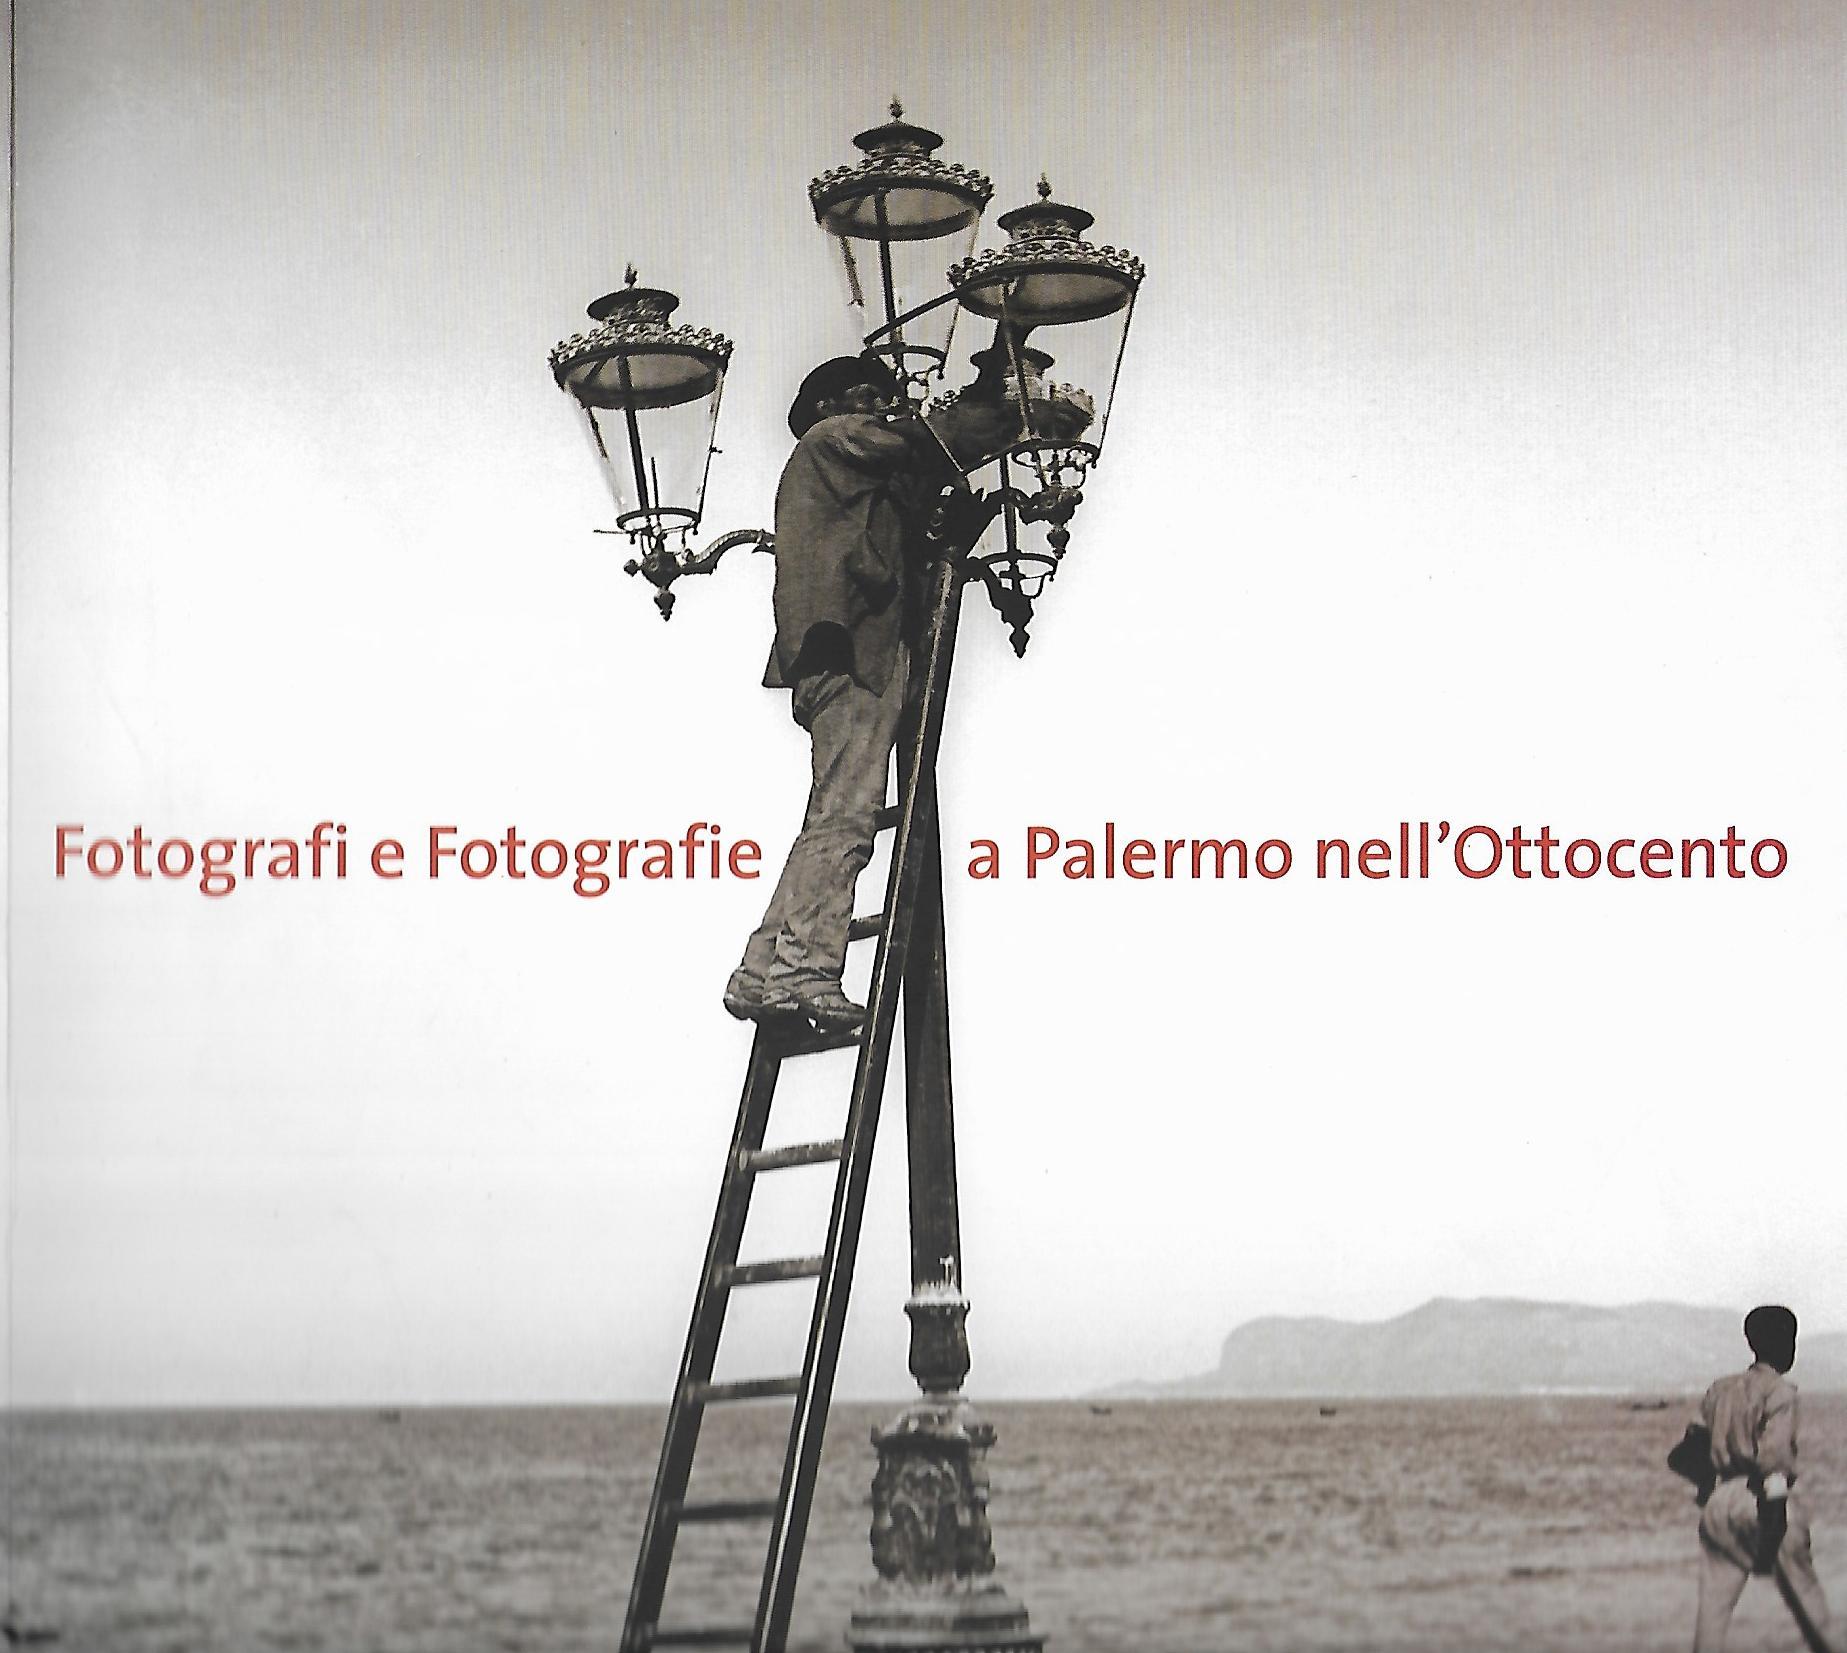 fallback-no-image-1662